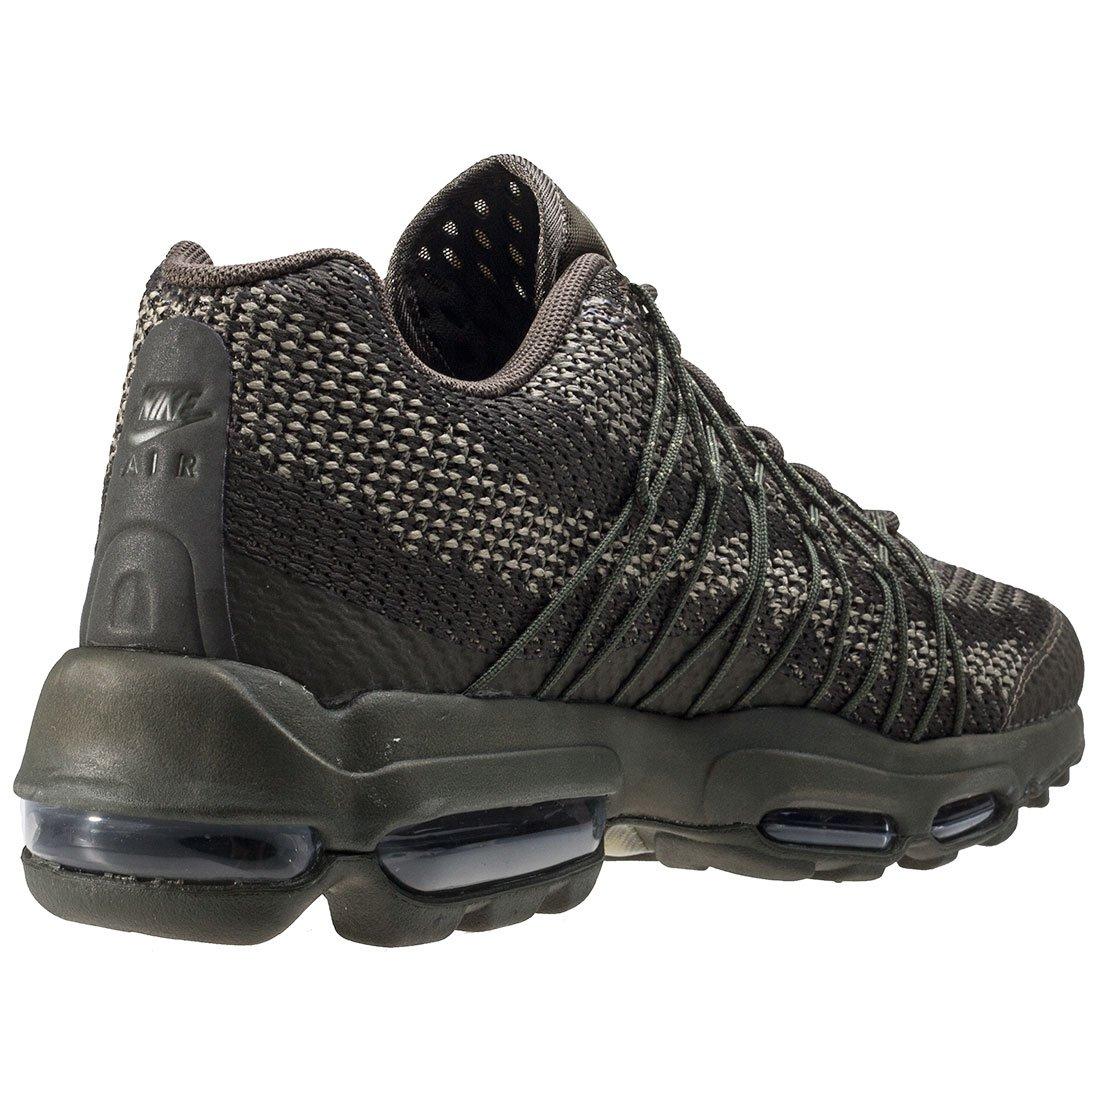 online retailer dc279 78701 Nike Air Max 95 Ultra Jacquard Mens Trainers Khaki - 8.5 UK  Amazon.co.uk   Shoes   Bags